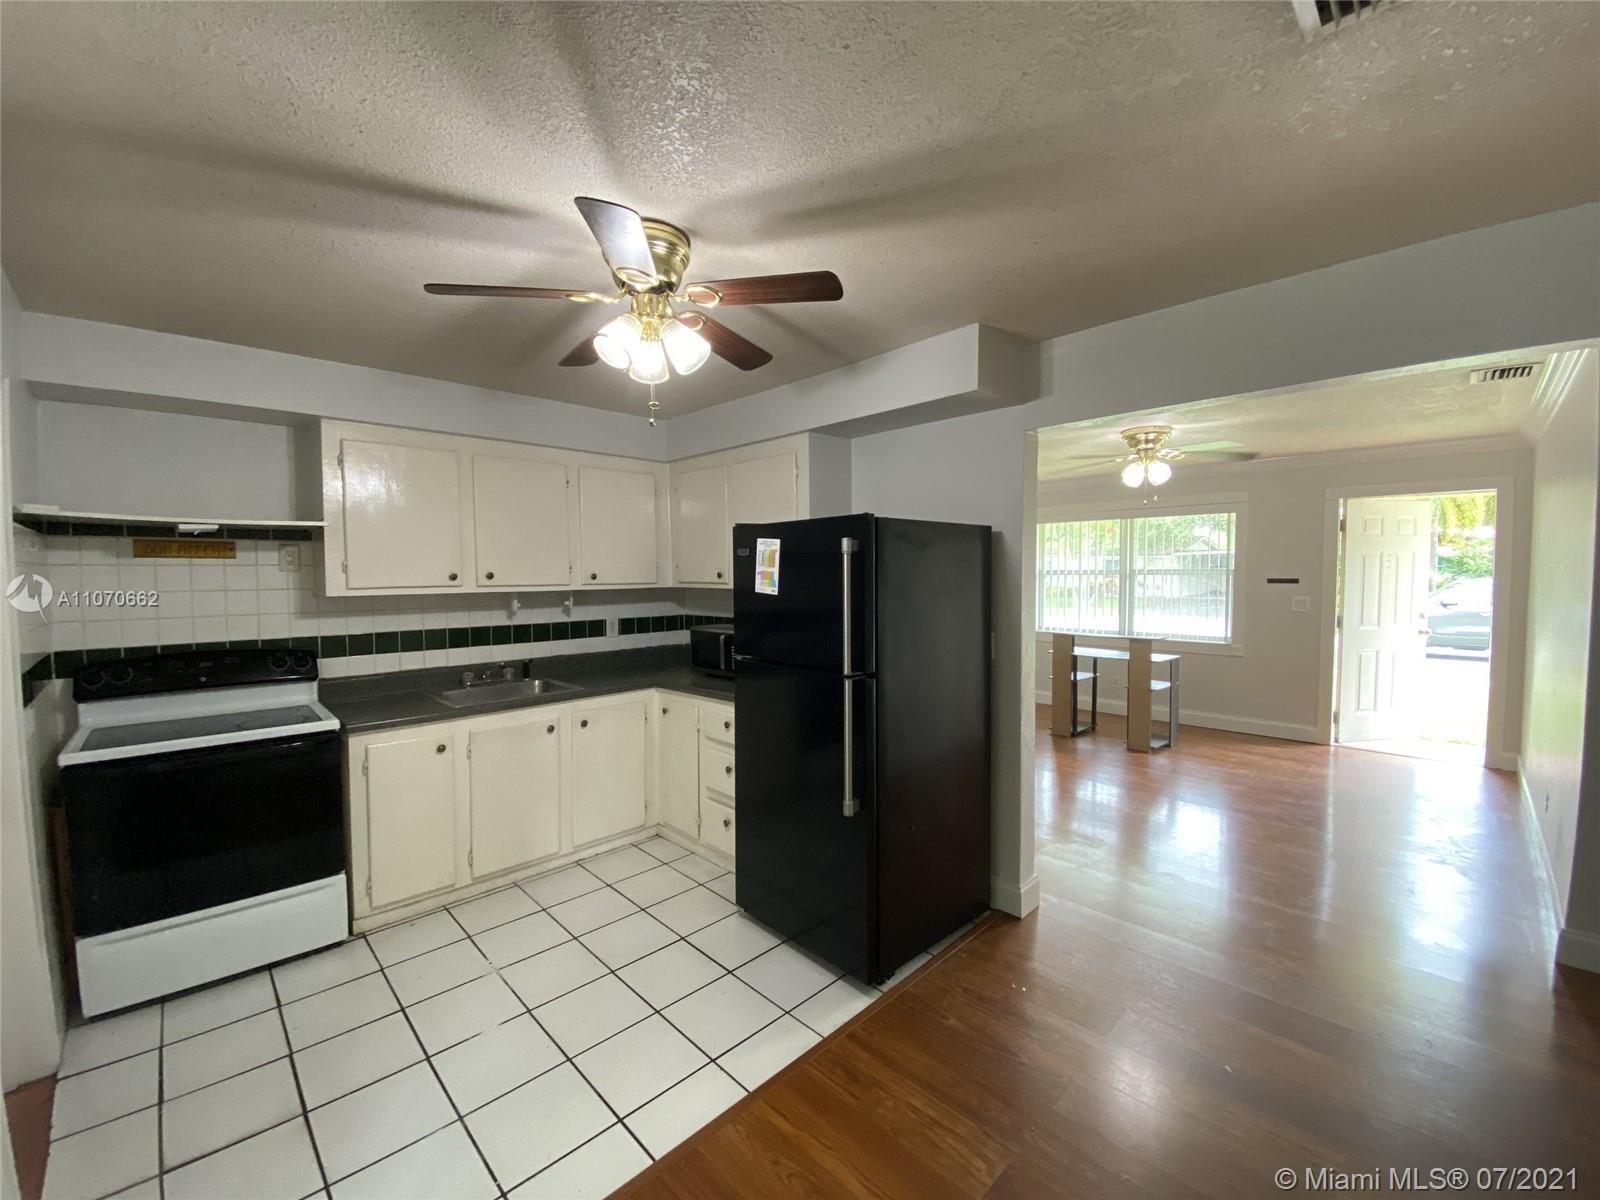 Photo of 9469 SW 52nd Ct #9469, Cooper City, FL 33328 (MLS # A11070662)